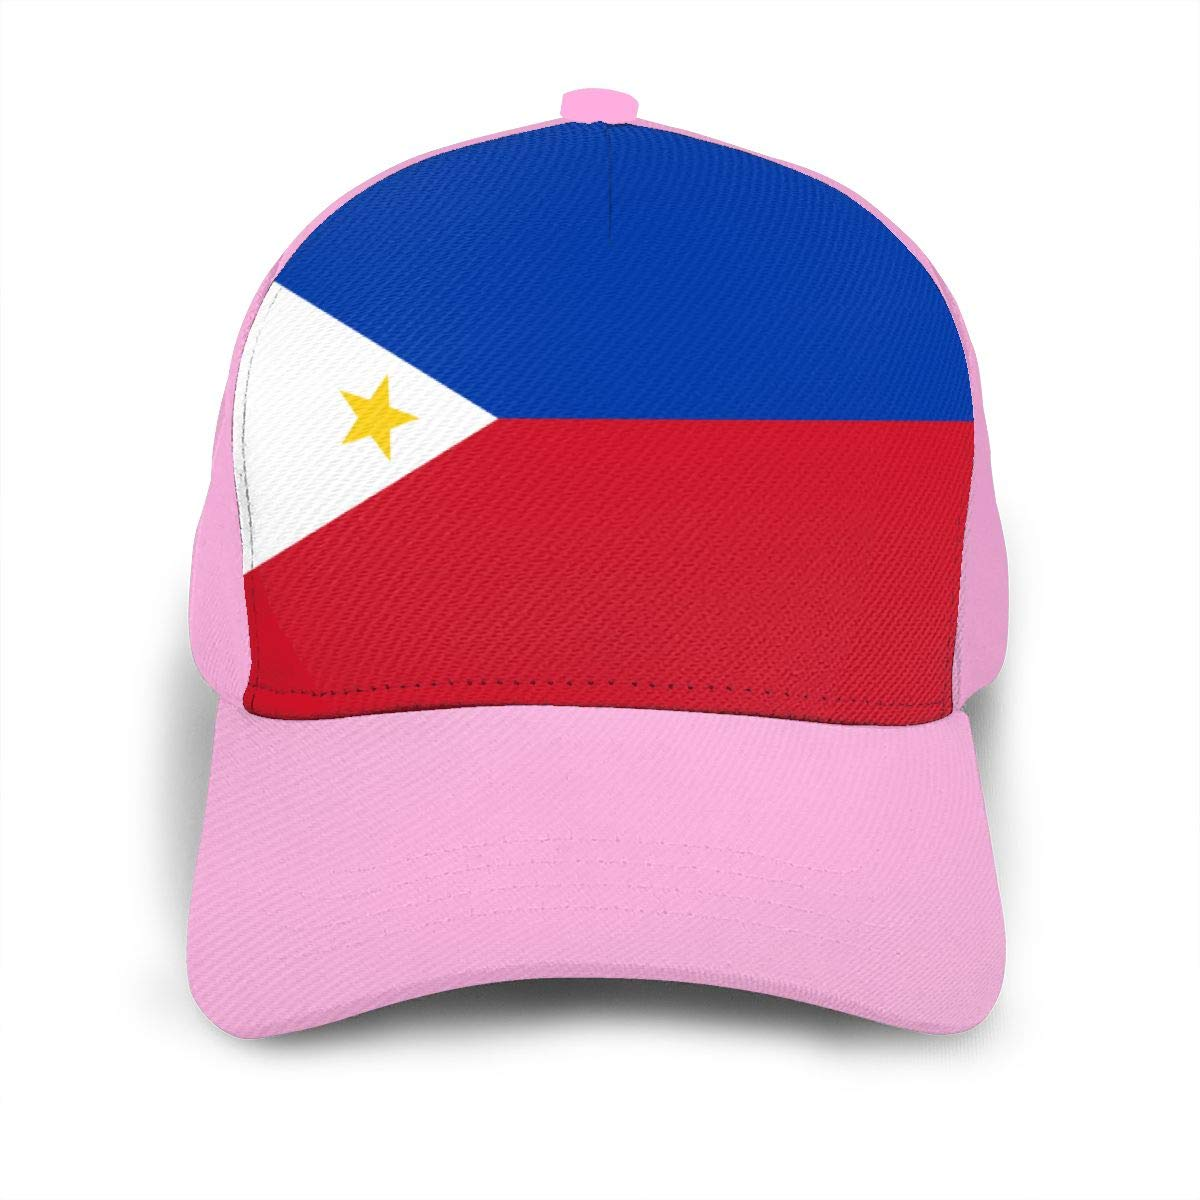 Y94OIW@MAO Philippines Flag Baseball Cap for Unisex Cotton Snapback Cap